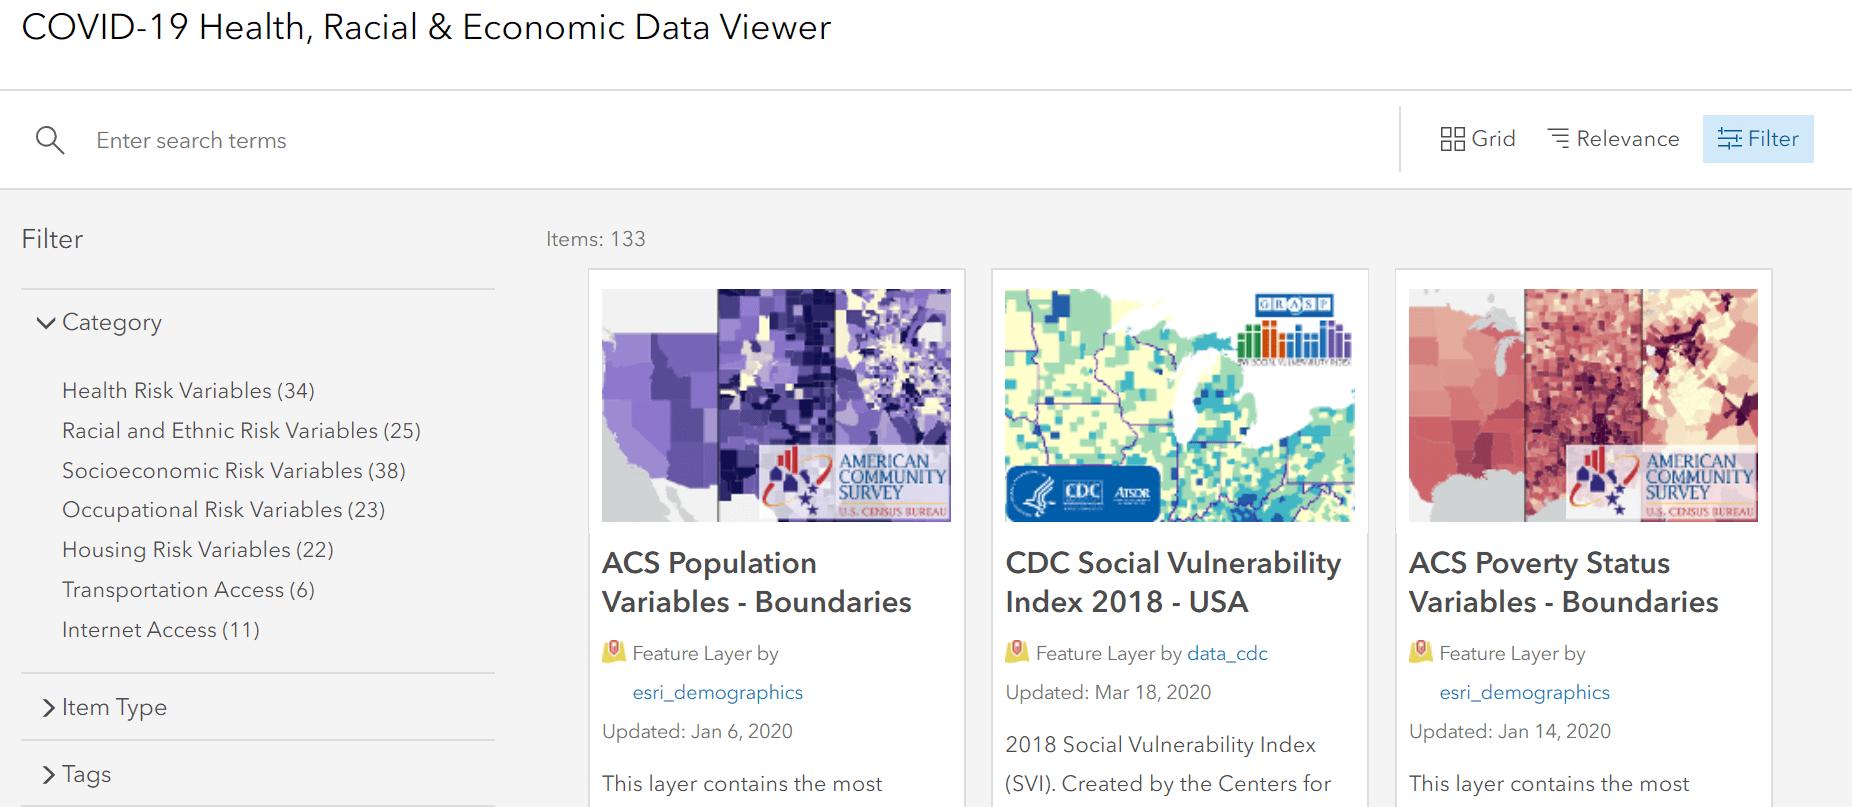 Screenshot of COVID-19 Health Racial & Economic Data Viewer